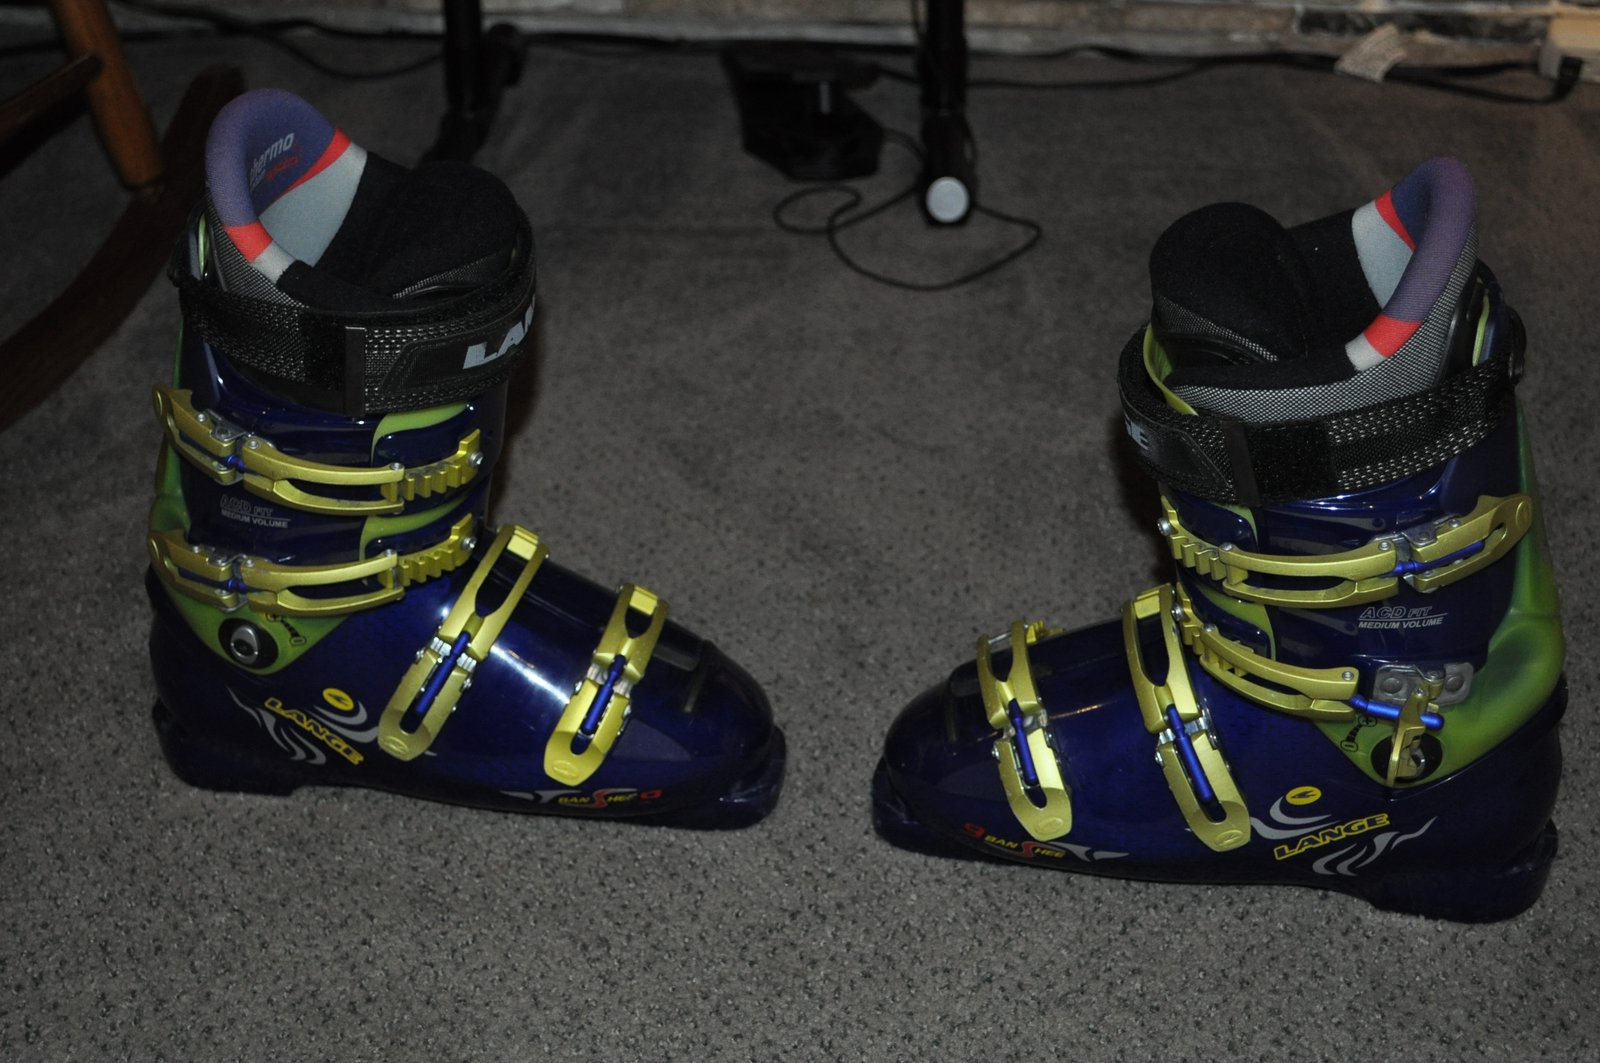 Lang boots